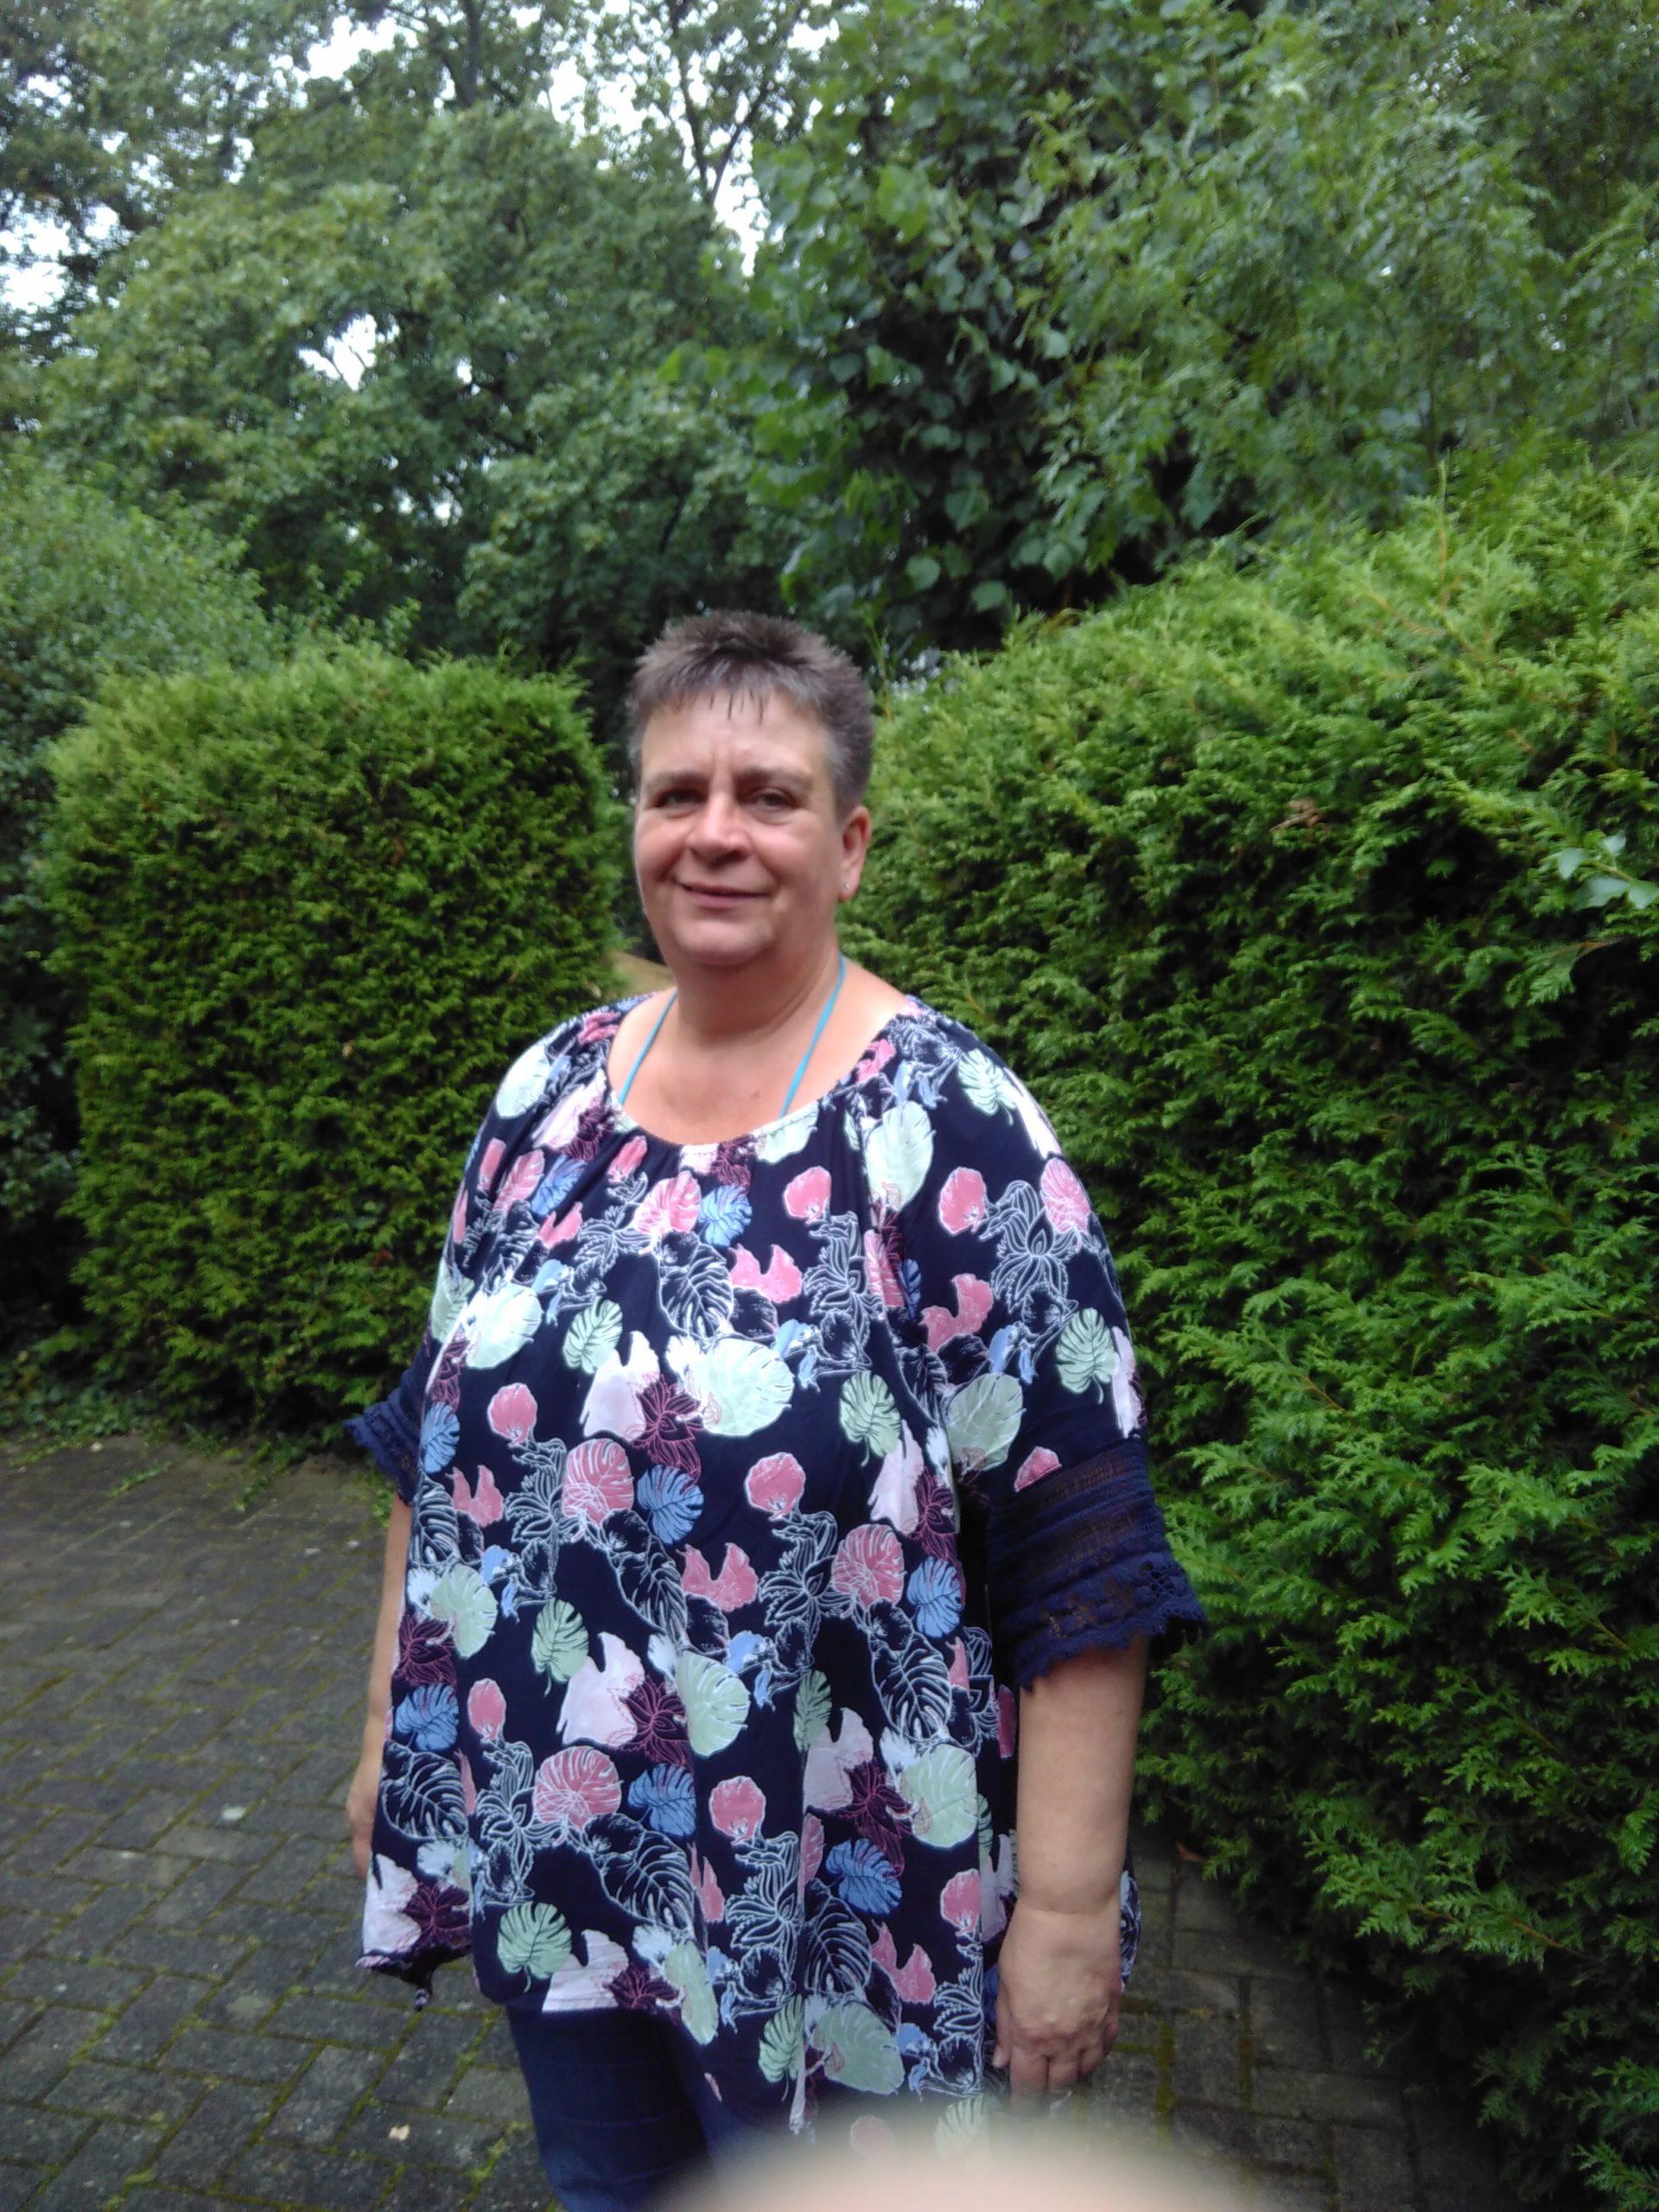 Drei Fragen An: Jeannette Romanus